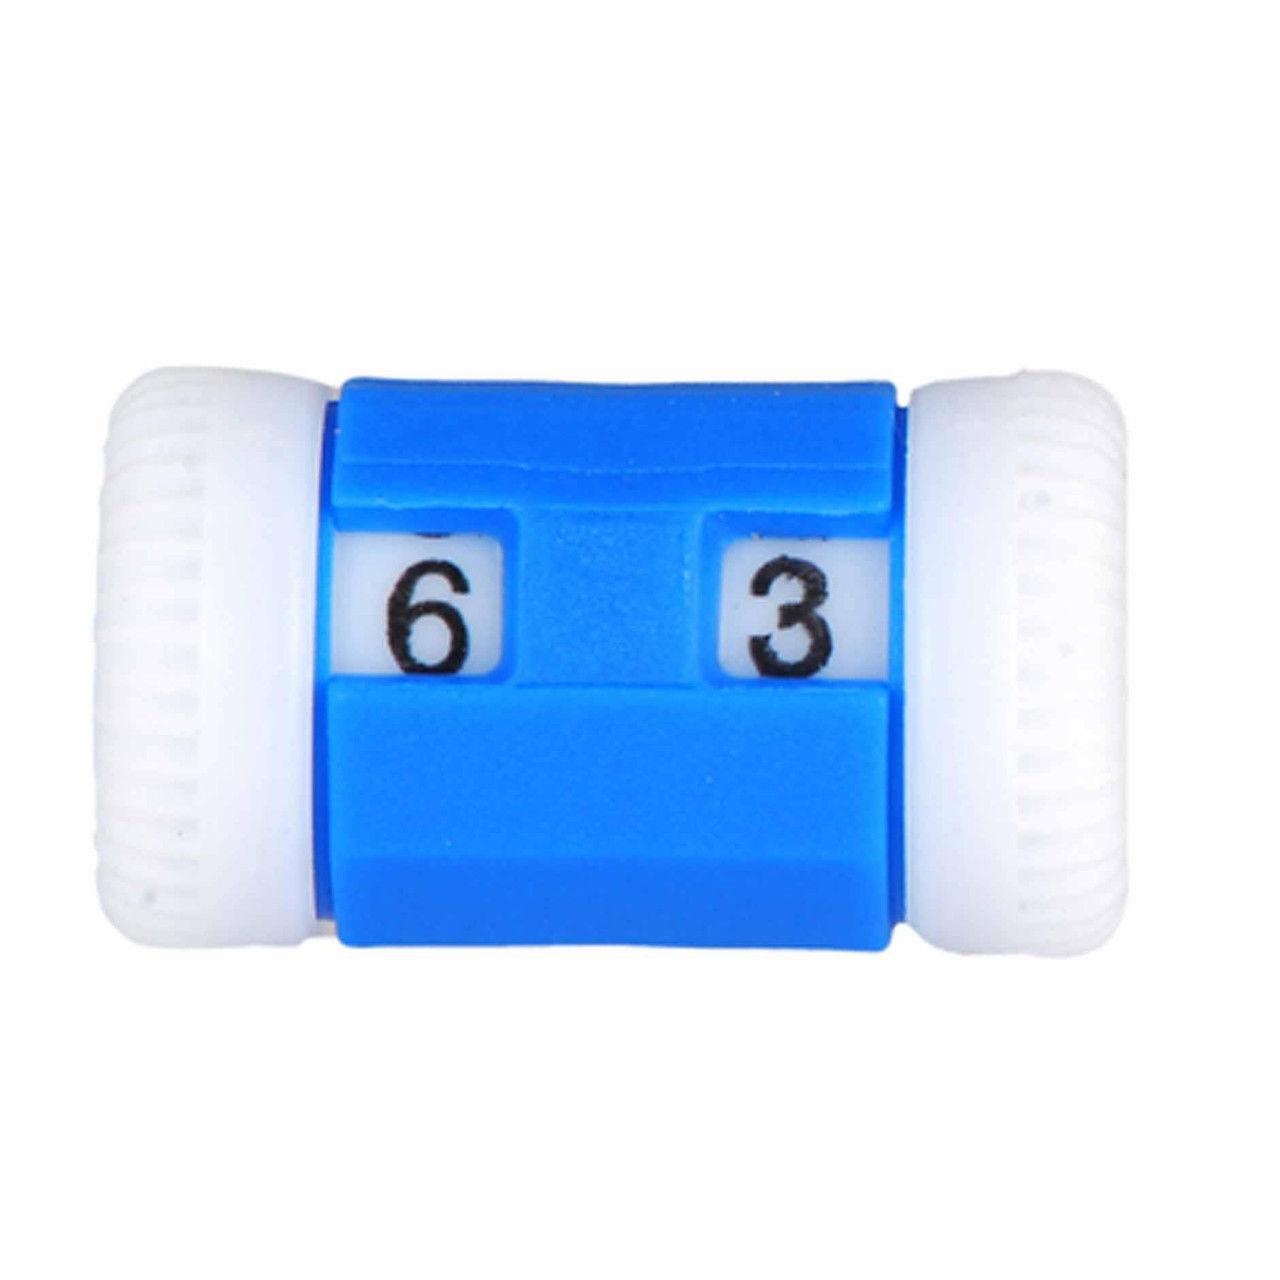 Счетчик рядов (маленький) Row Counters KnitPro.